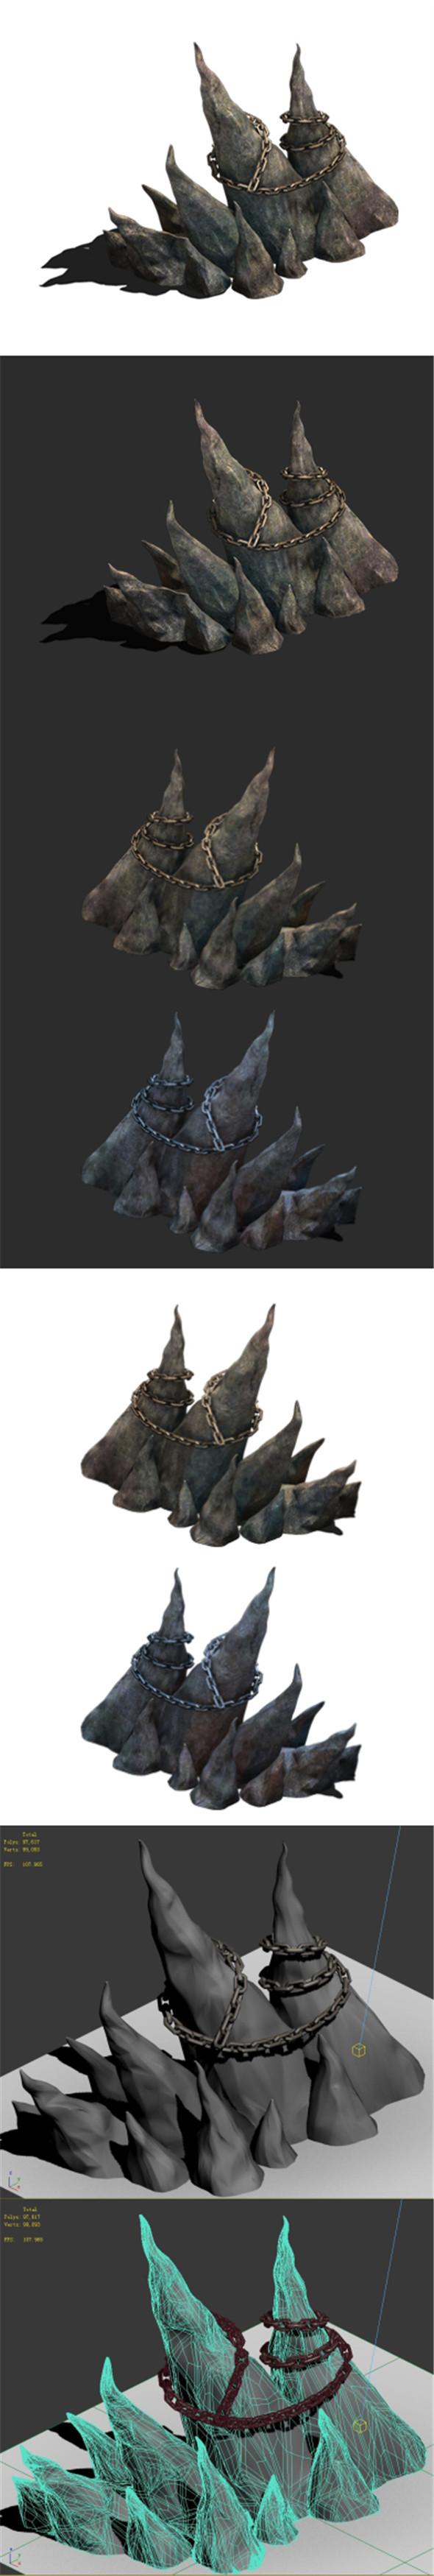 Wicked graves - stone teeth 01 - 3DOcean Item for Sale